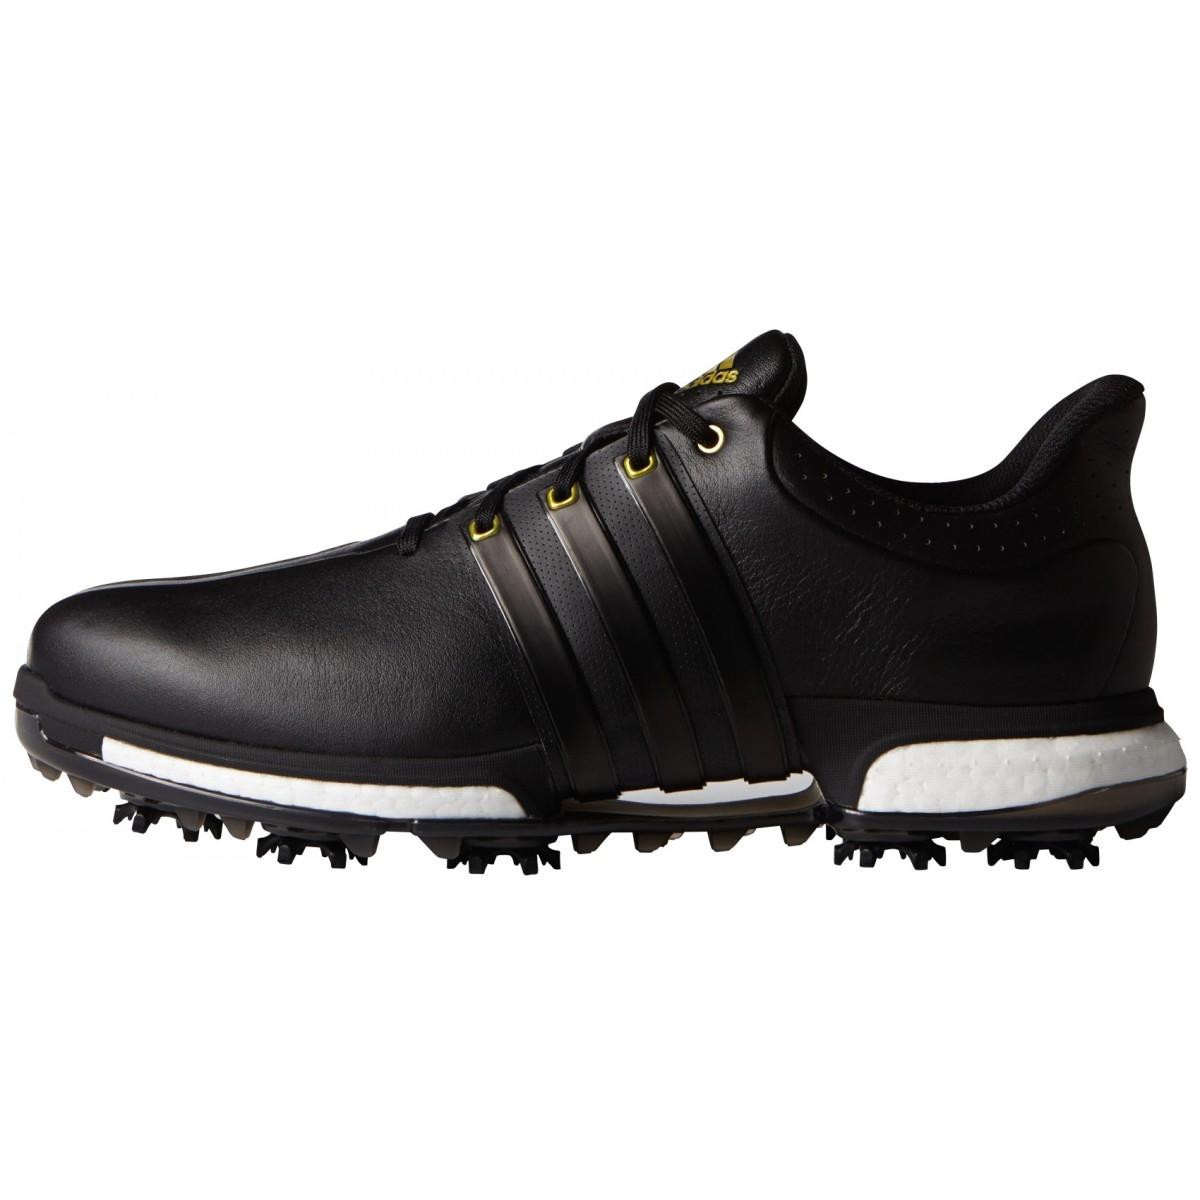 Adidas Tour 360 Boost Black/Gold Metallic